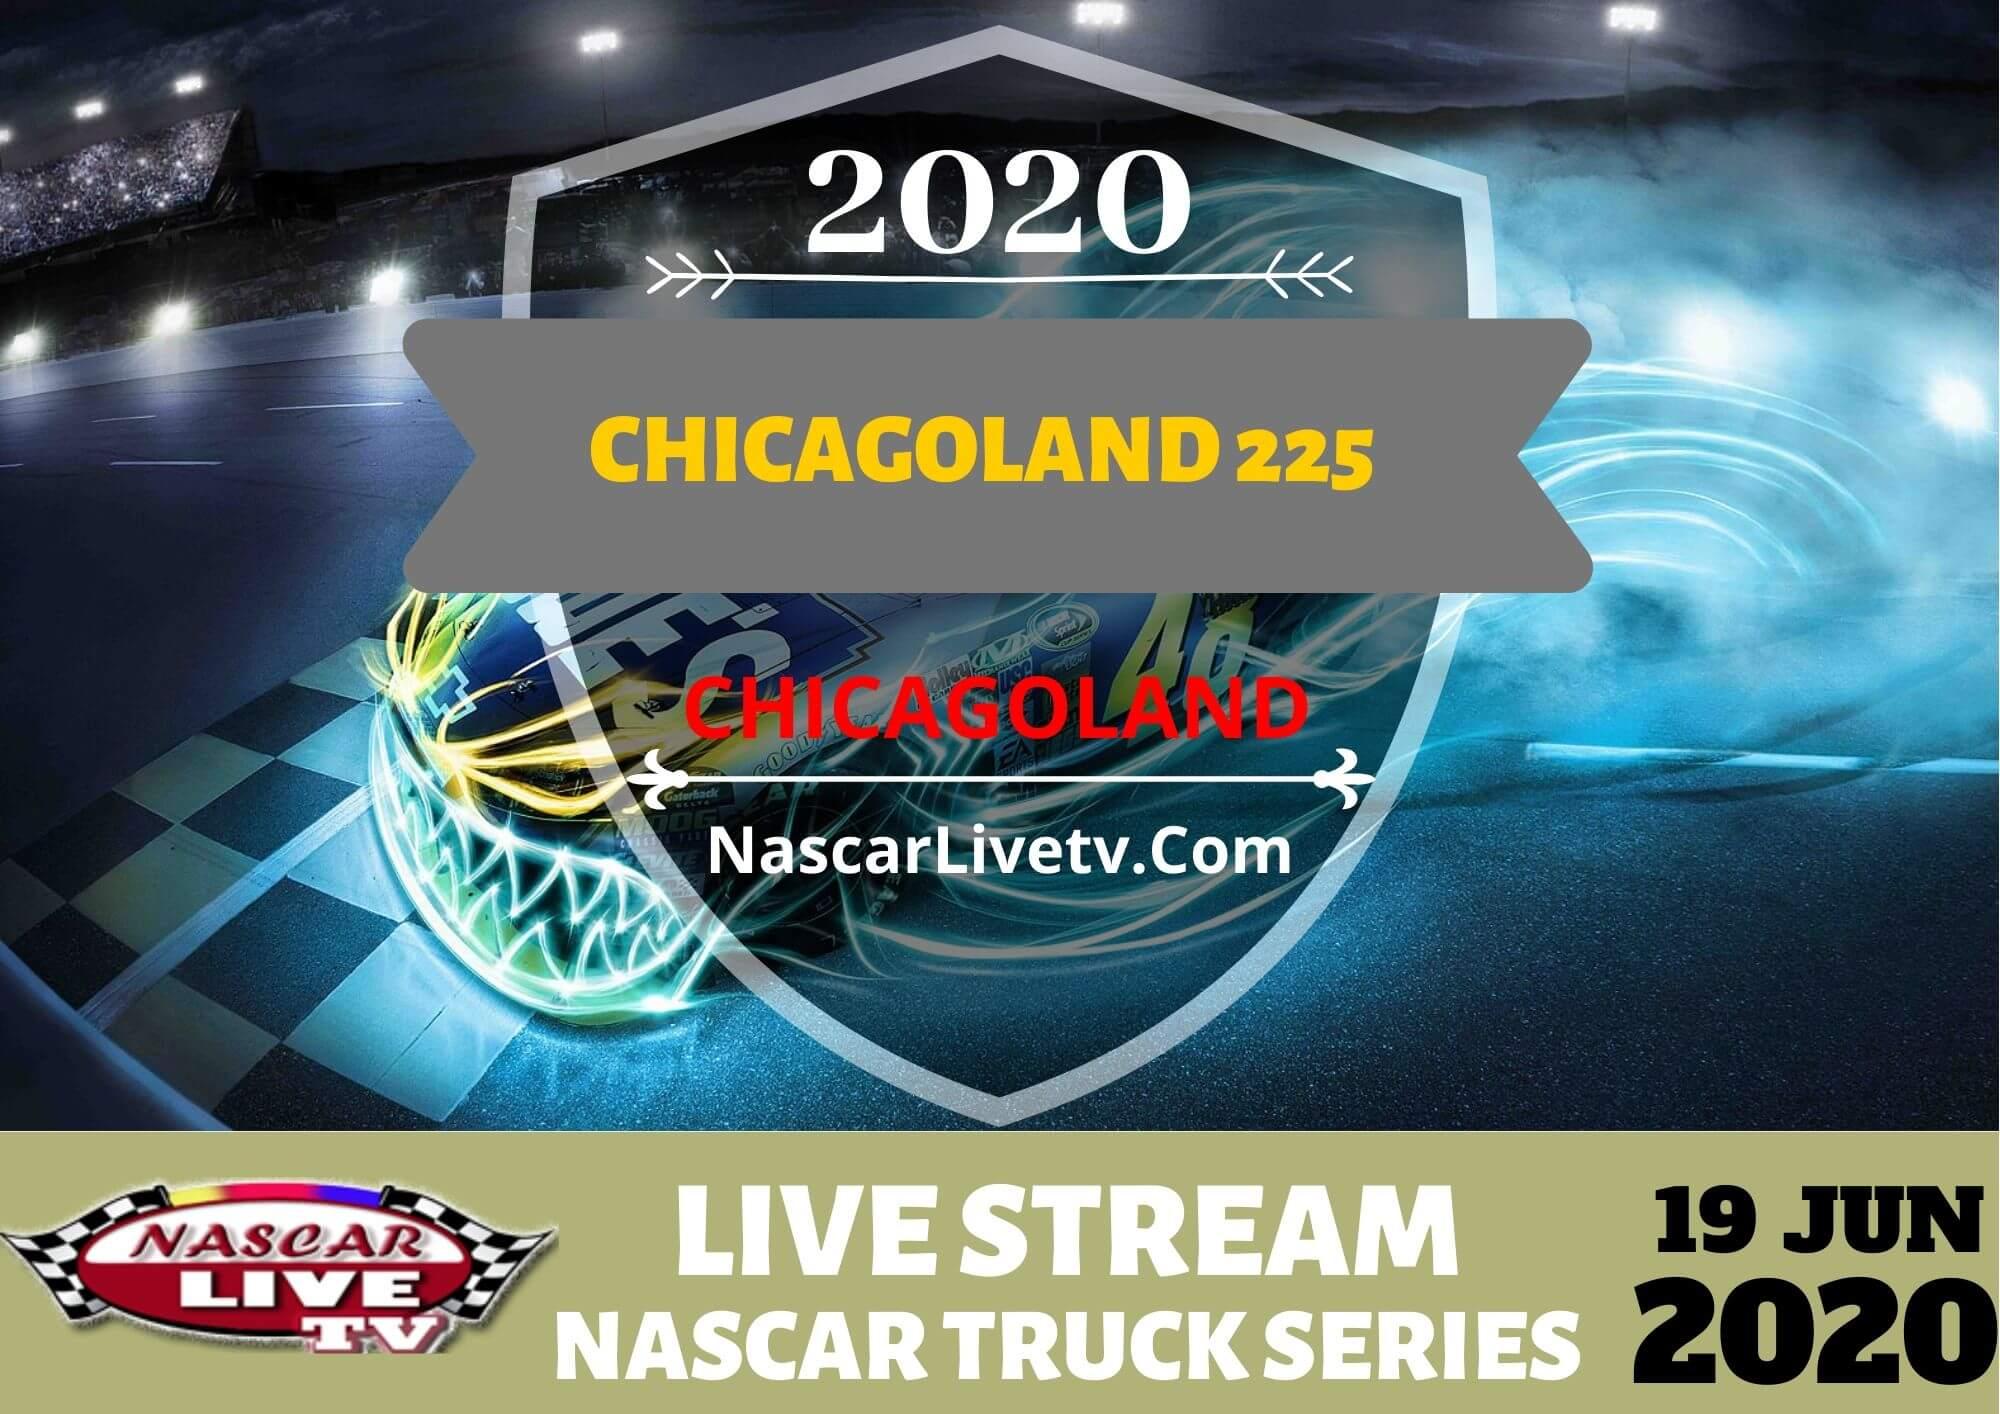 NGOTS Chicagoland 225 Live Stream 2020